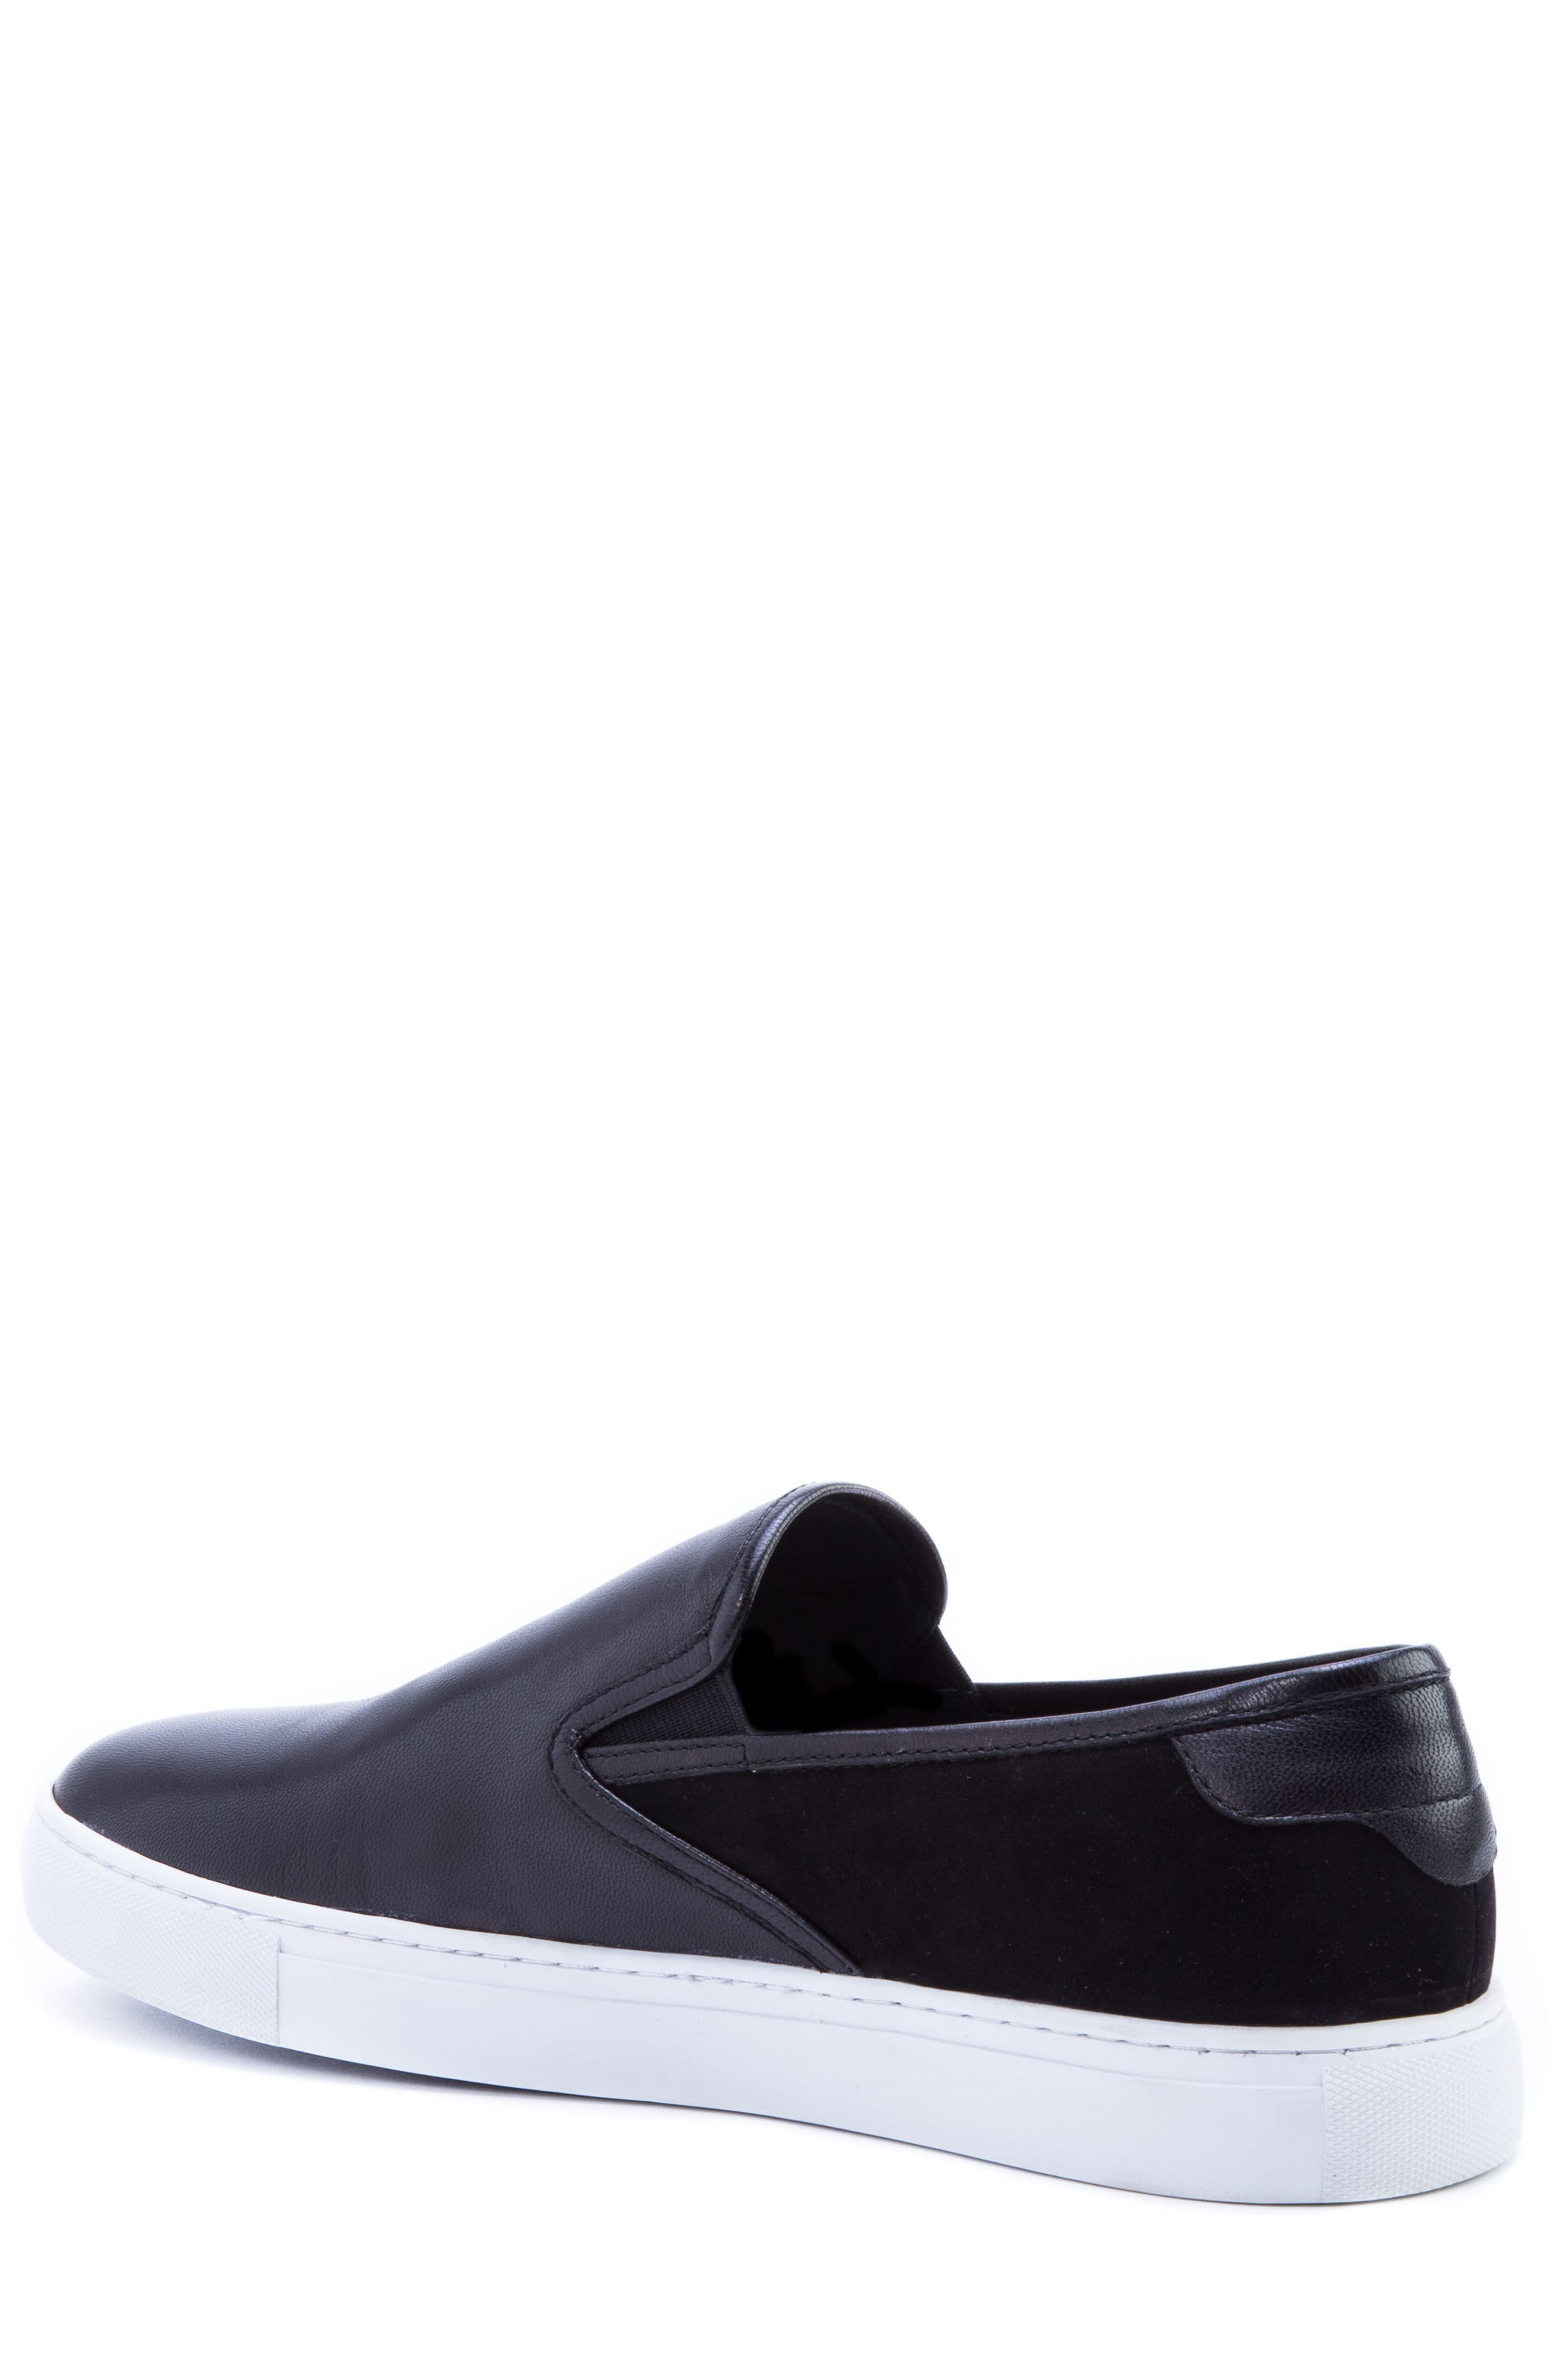 Duchamps Slip-On Sneaker,                             Alternate thumbnail 2, color,                             Black Leather/ Suede